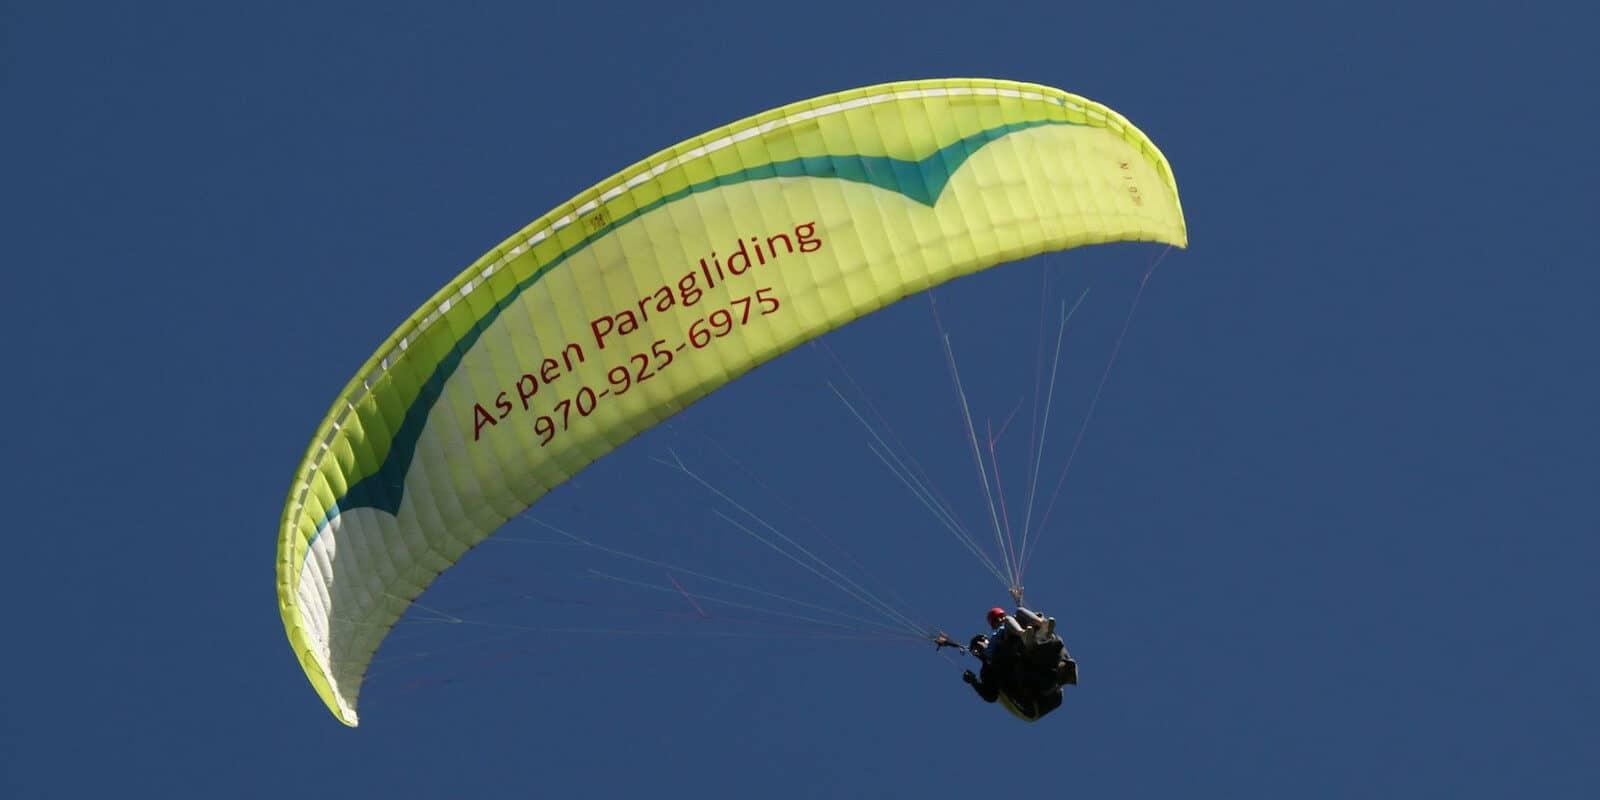 Image of the Aspen Paragliding parachute